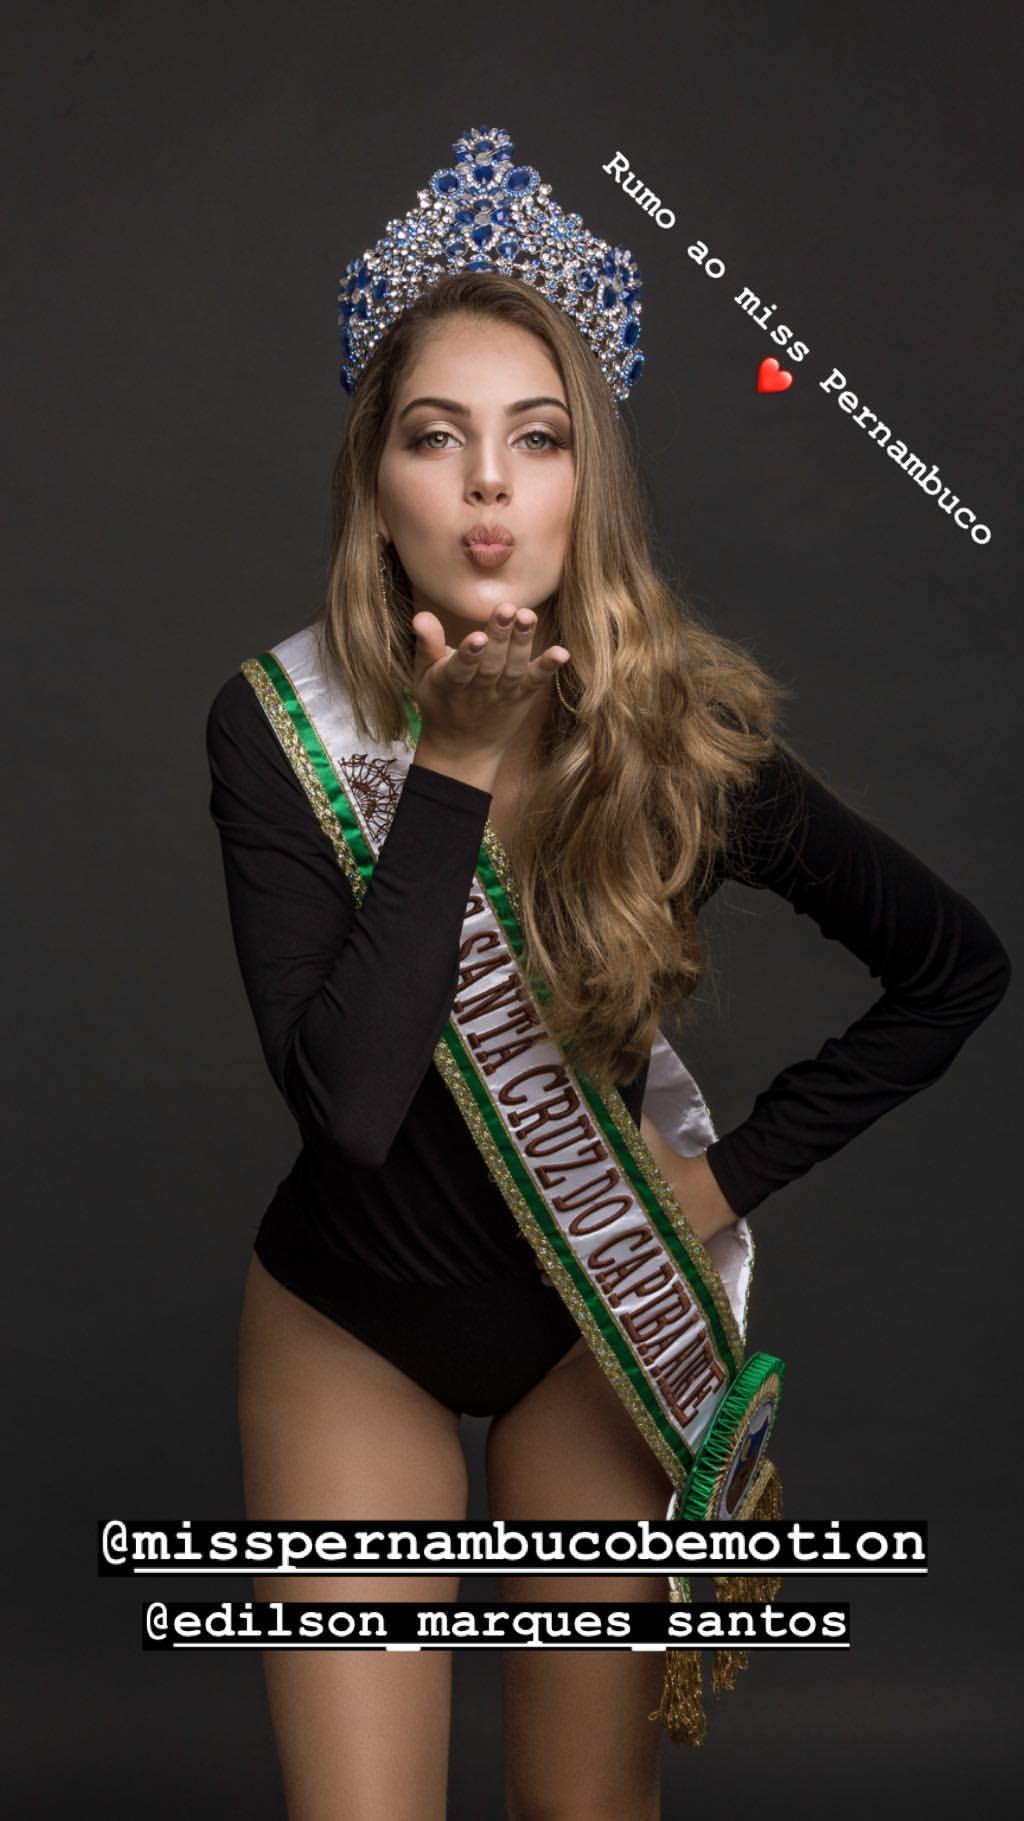 eduarda ribeiro, miss santacruz do capibaribe 2019. - Página 2 46340510